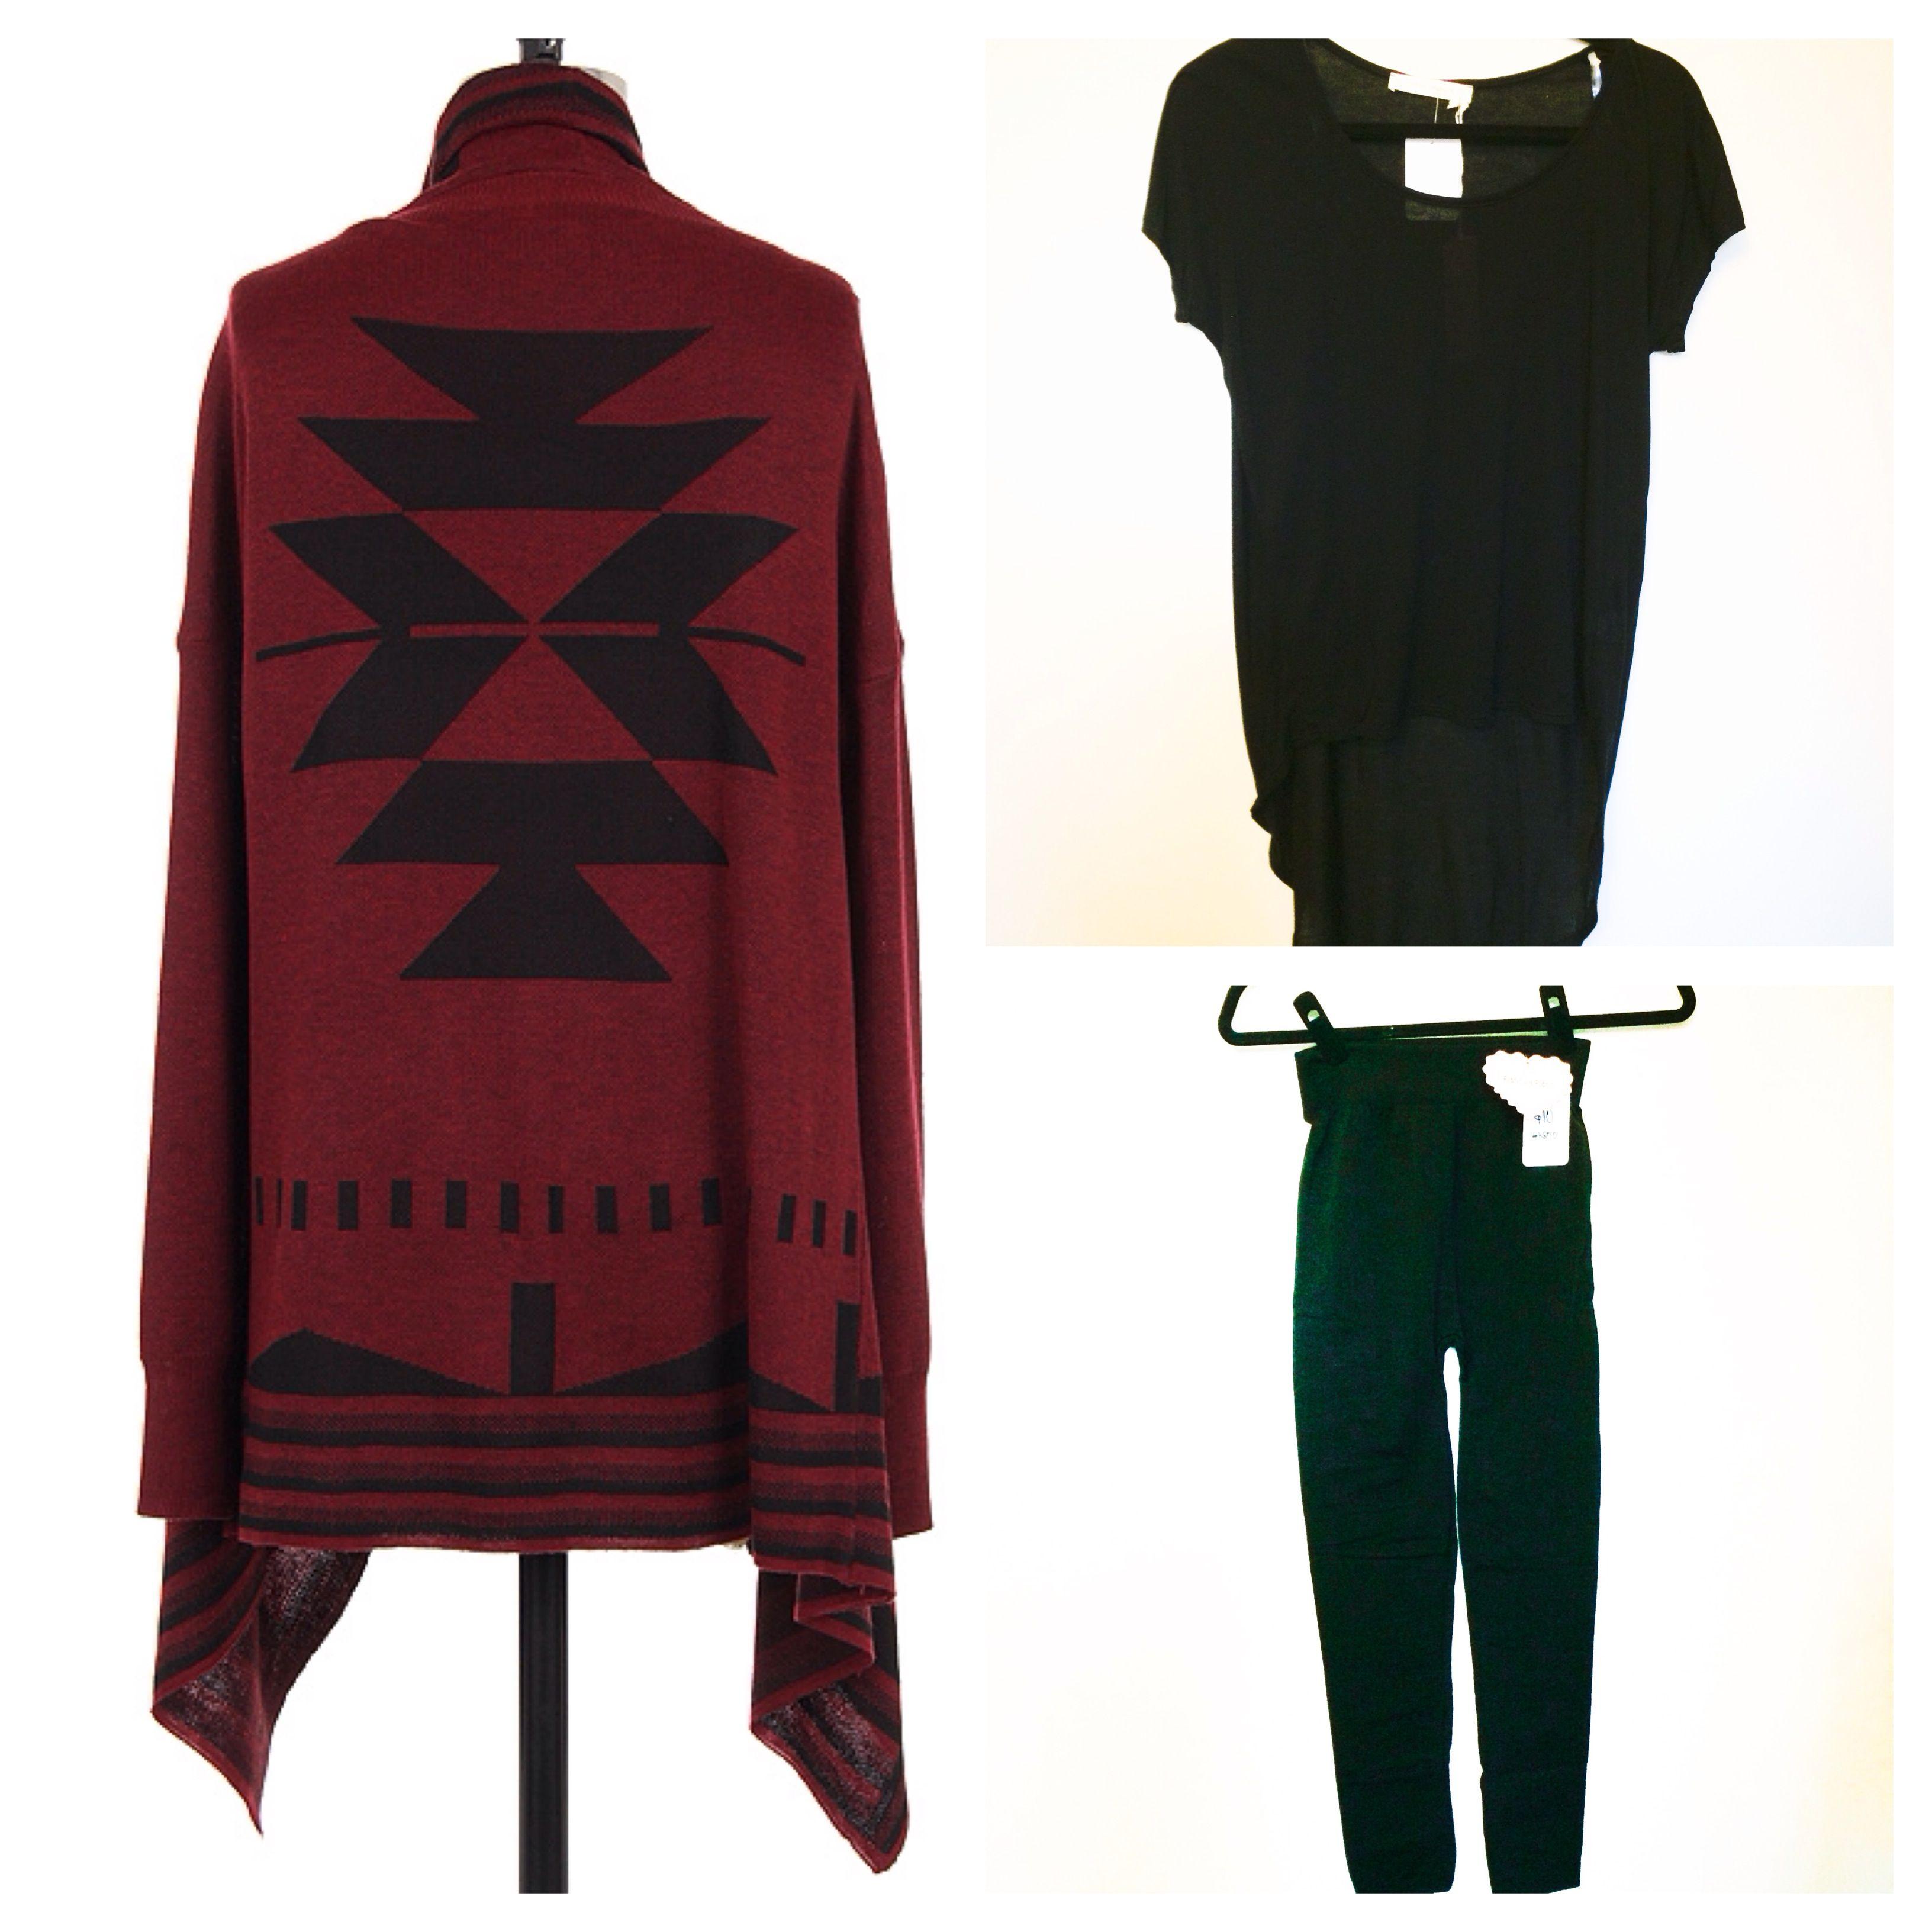 Aztec flyaway cardigan in Burgundy $44 in store at Kali Rose Boutique